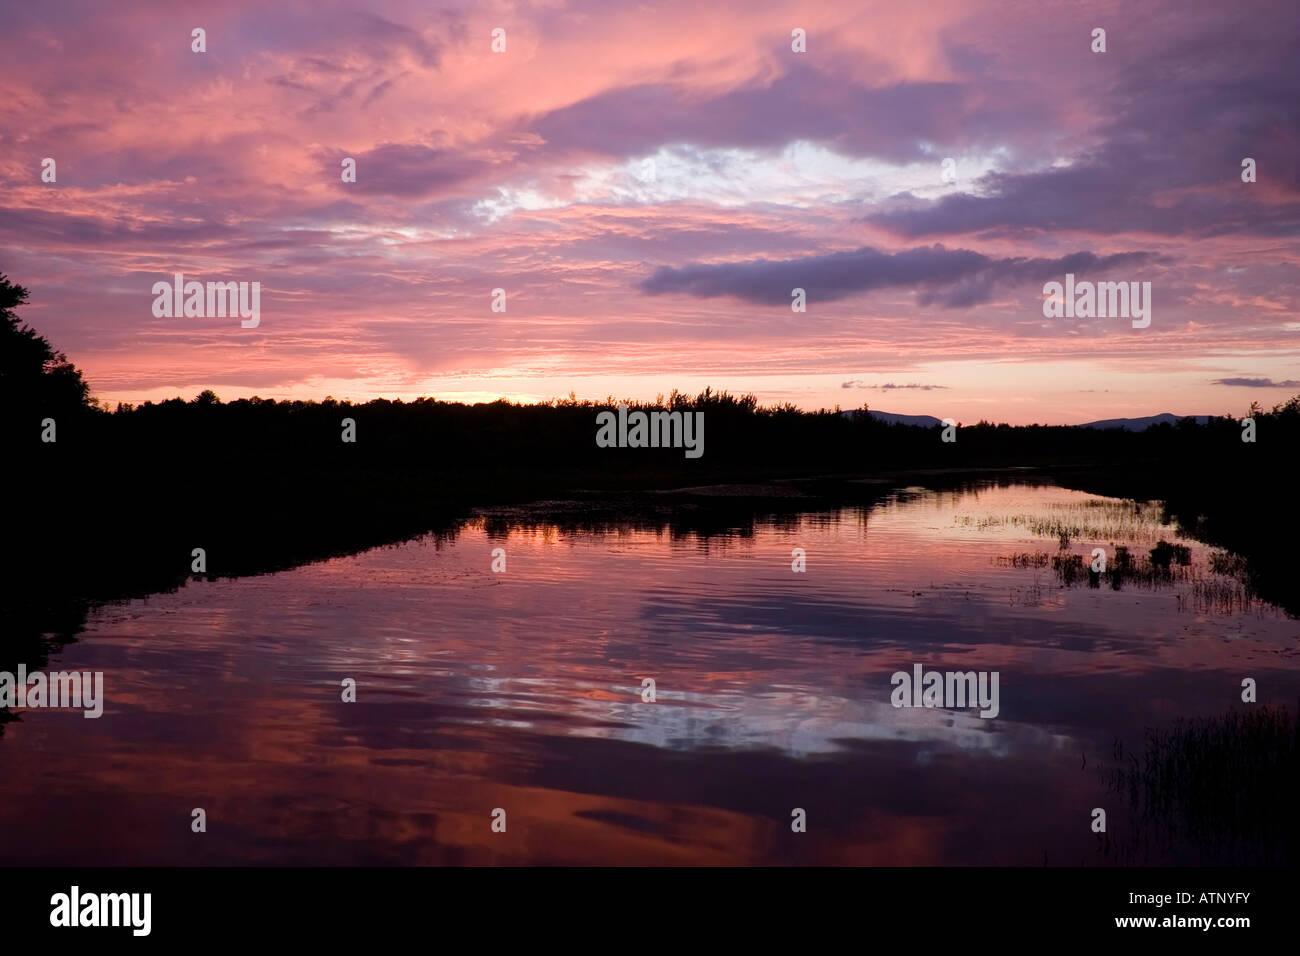 Sunset over the Sacandaga River, Adirondack Mountains, New York - Stock Image